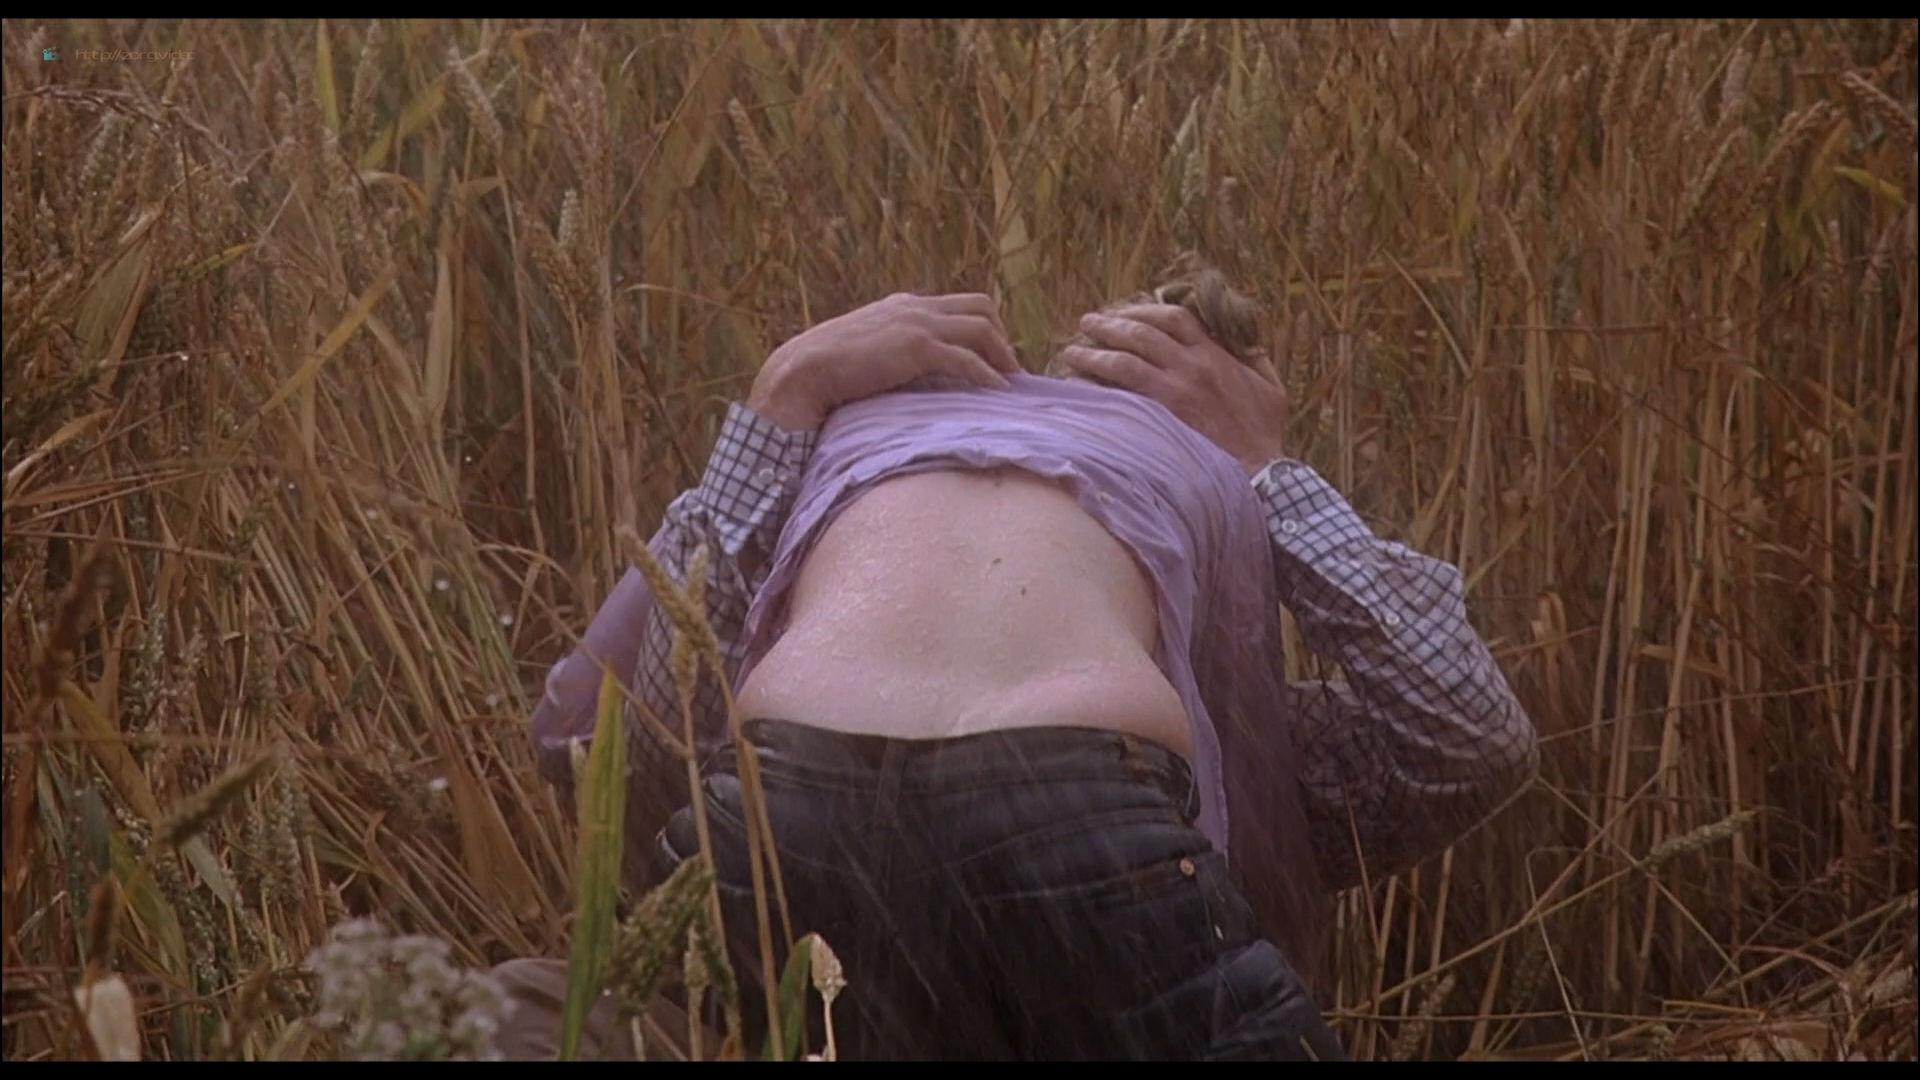 Scarlett Johansson see through and sex - Match Point (2005) HD 1080p BluRay (11)